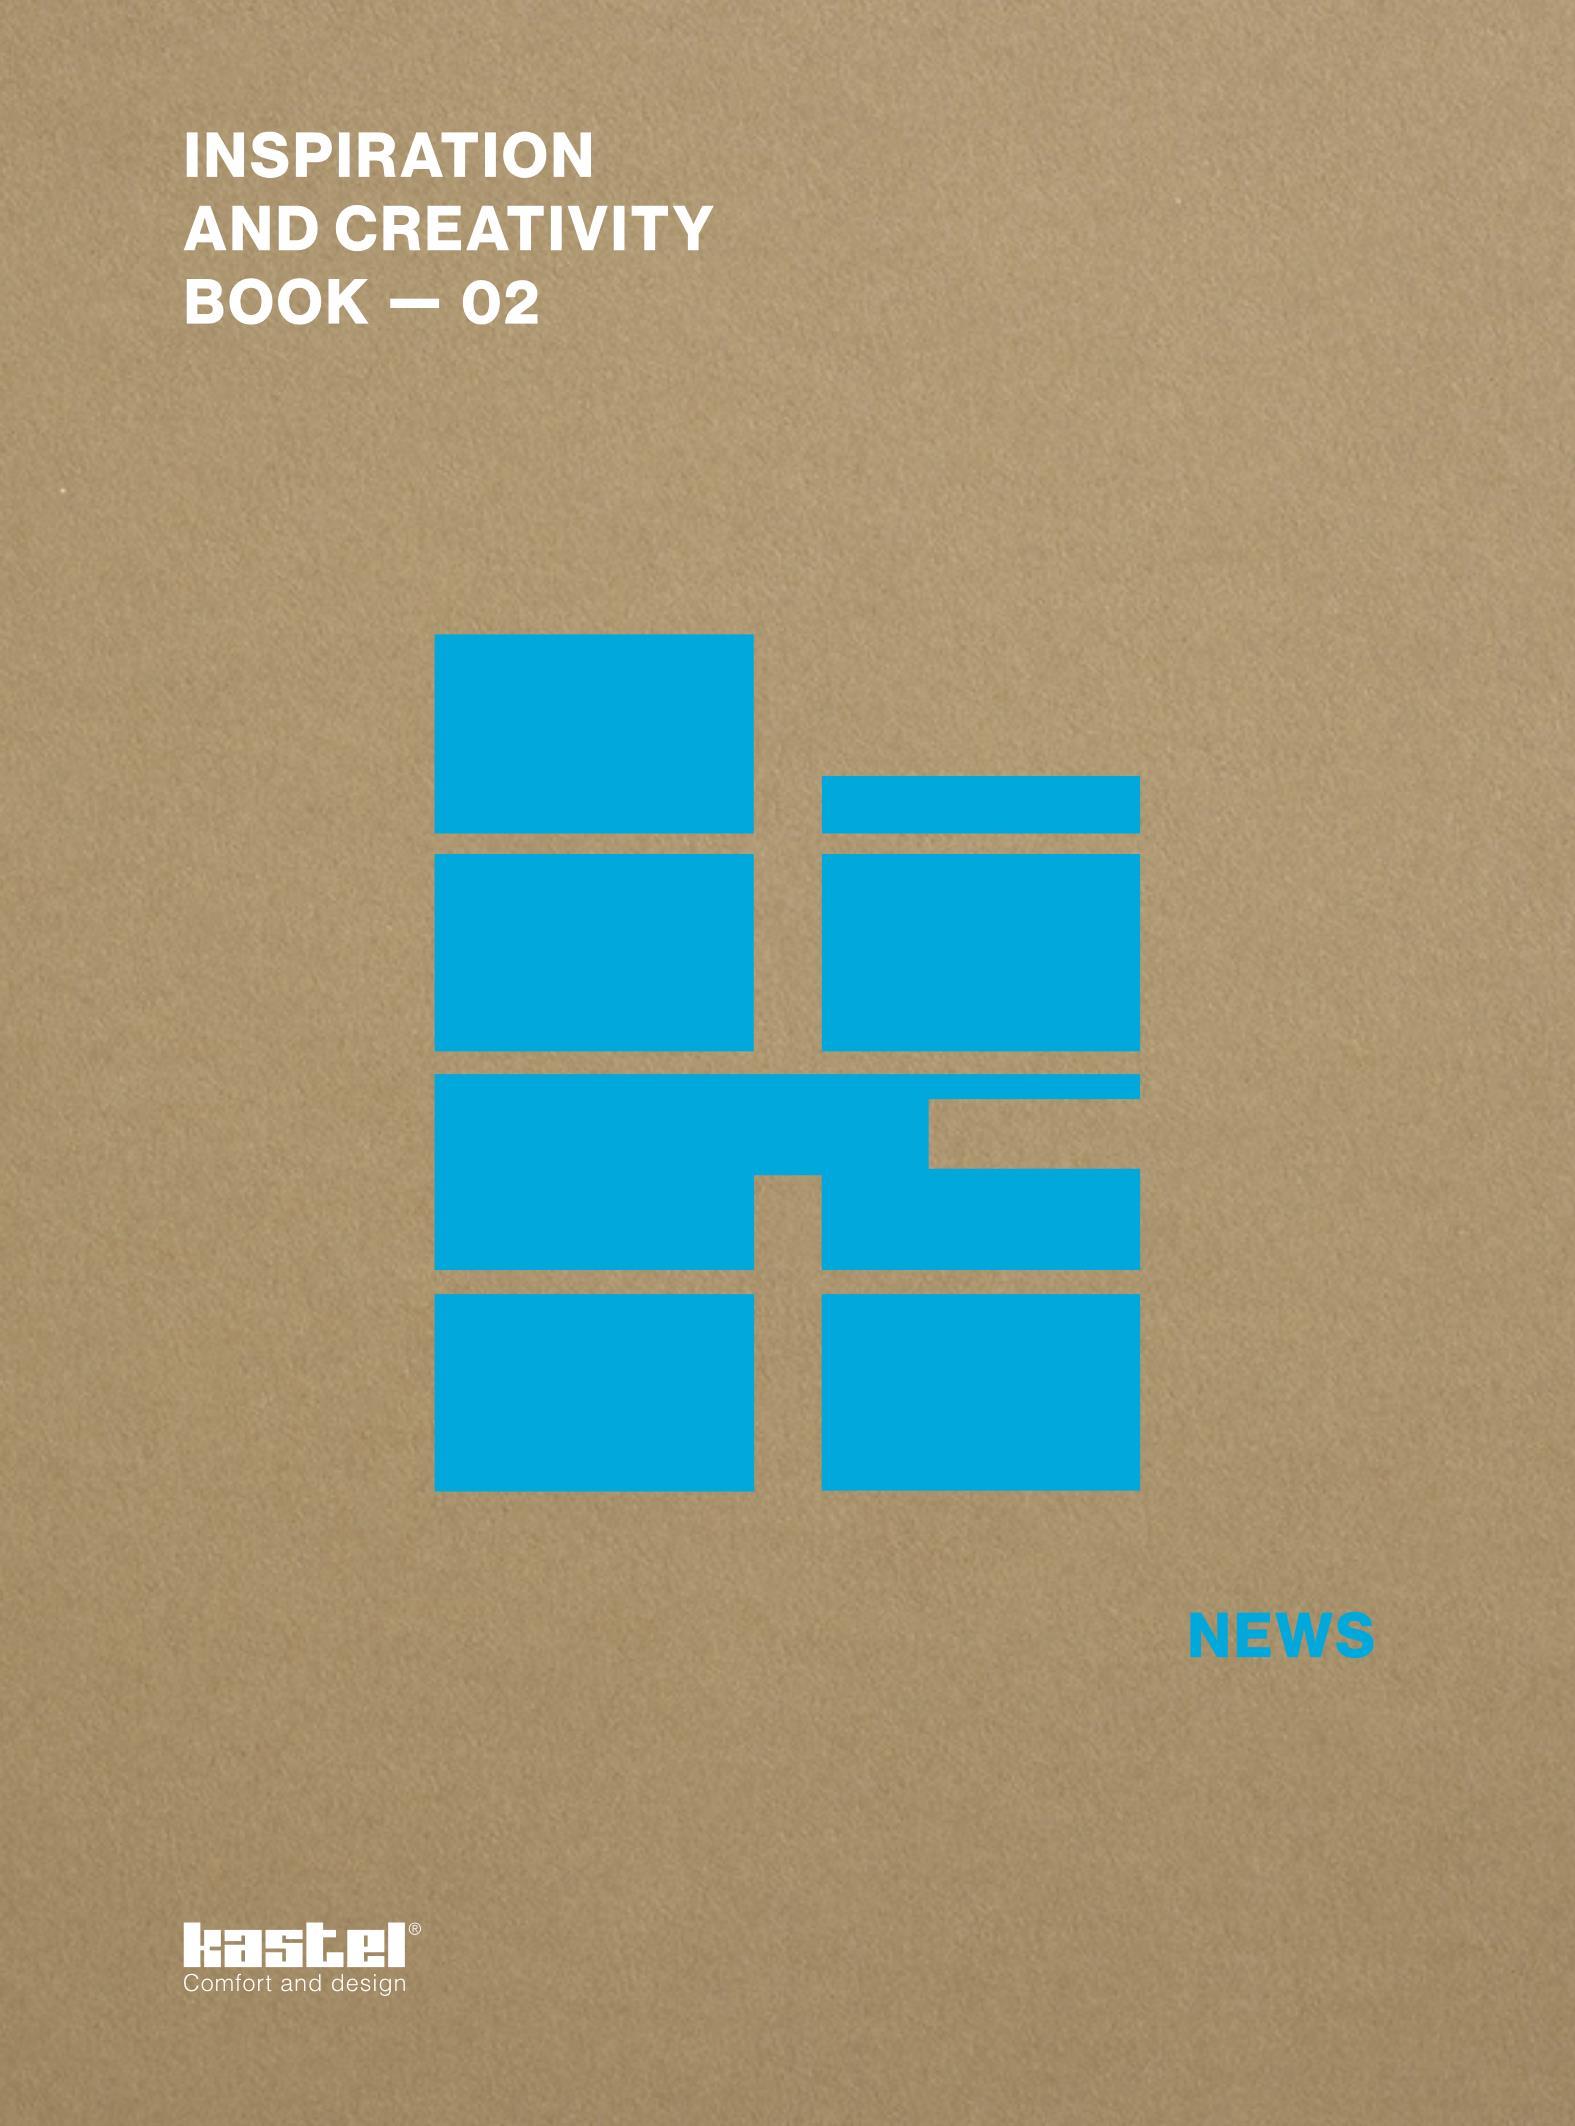 Inspiration and Creativity book-02